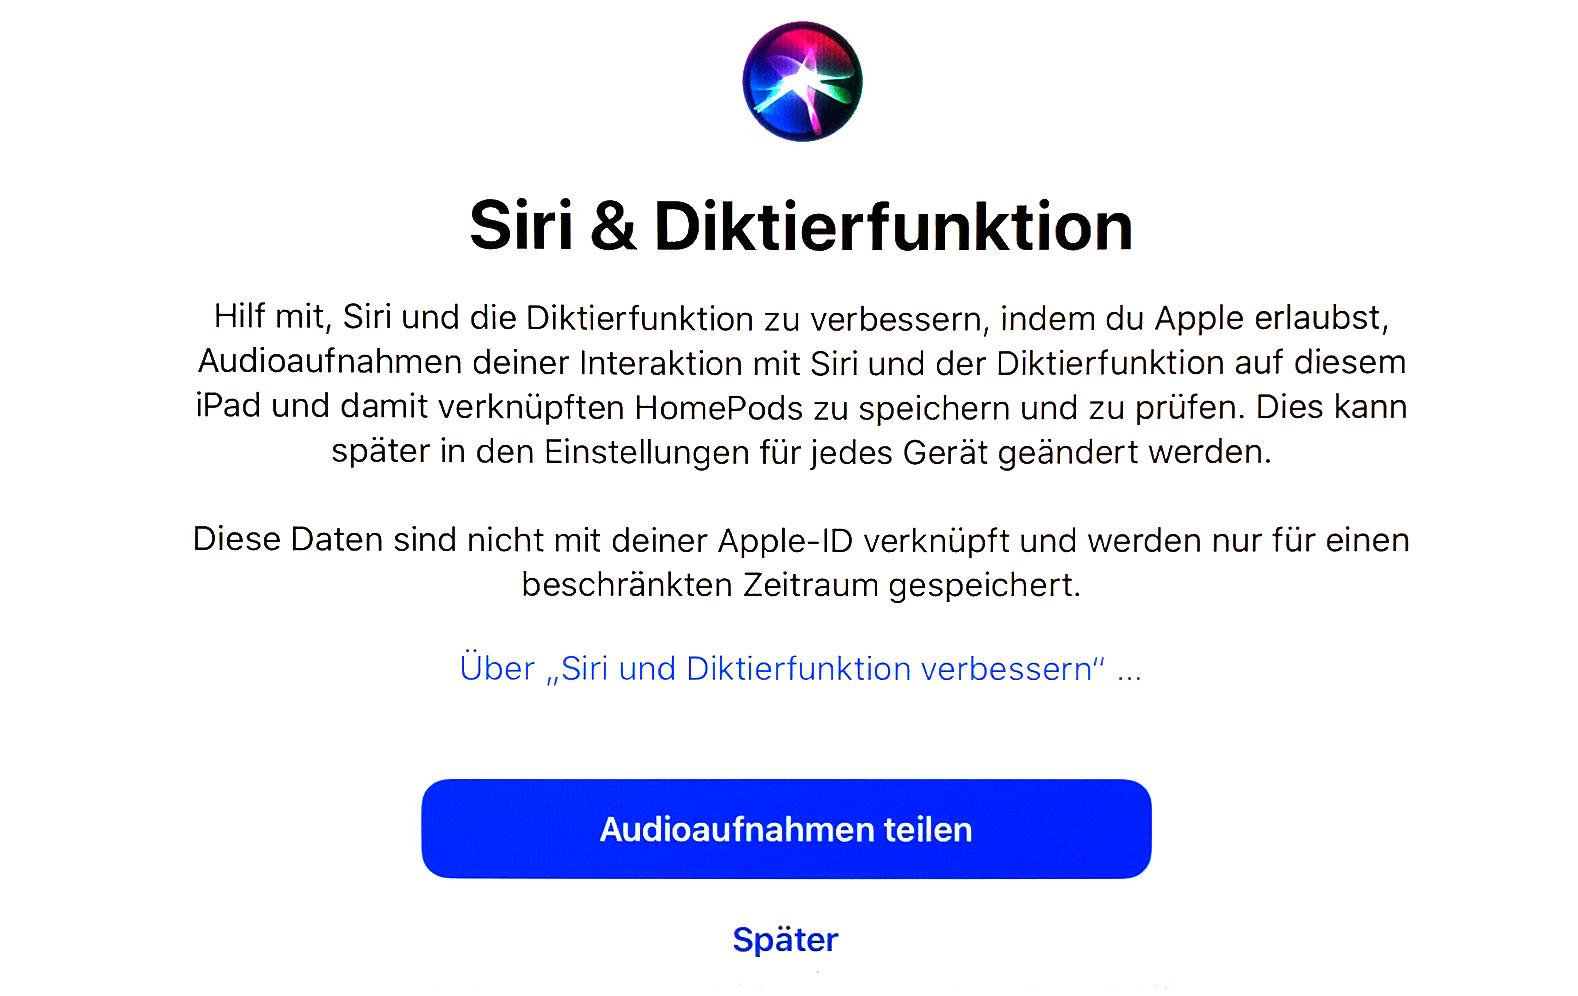 Siri Datenschutz